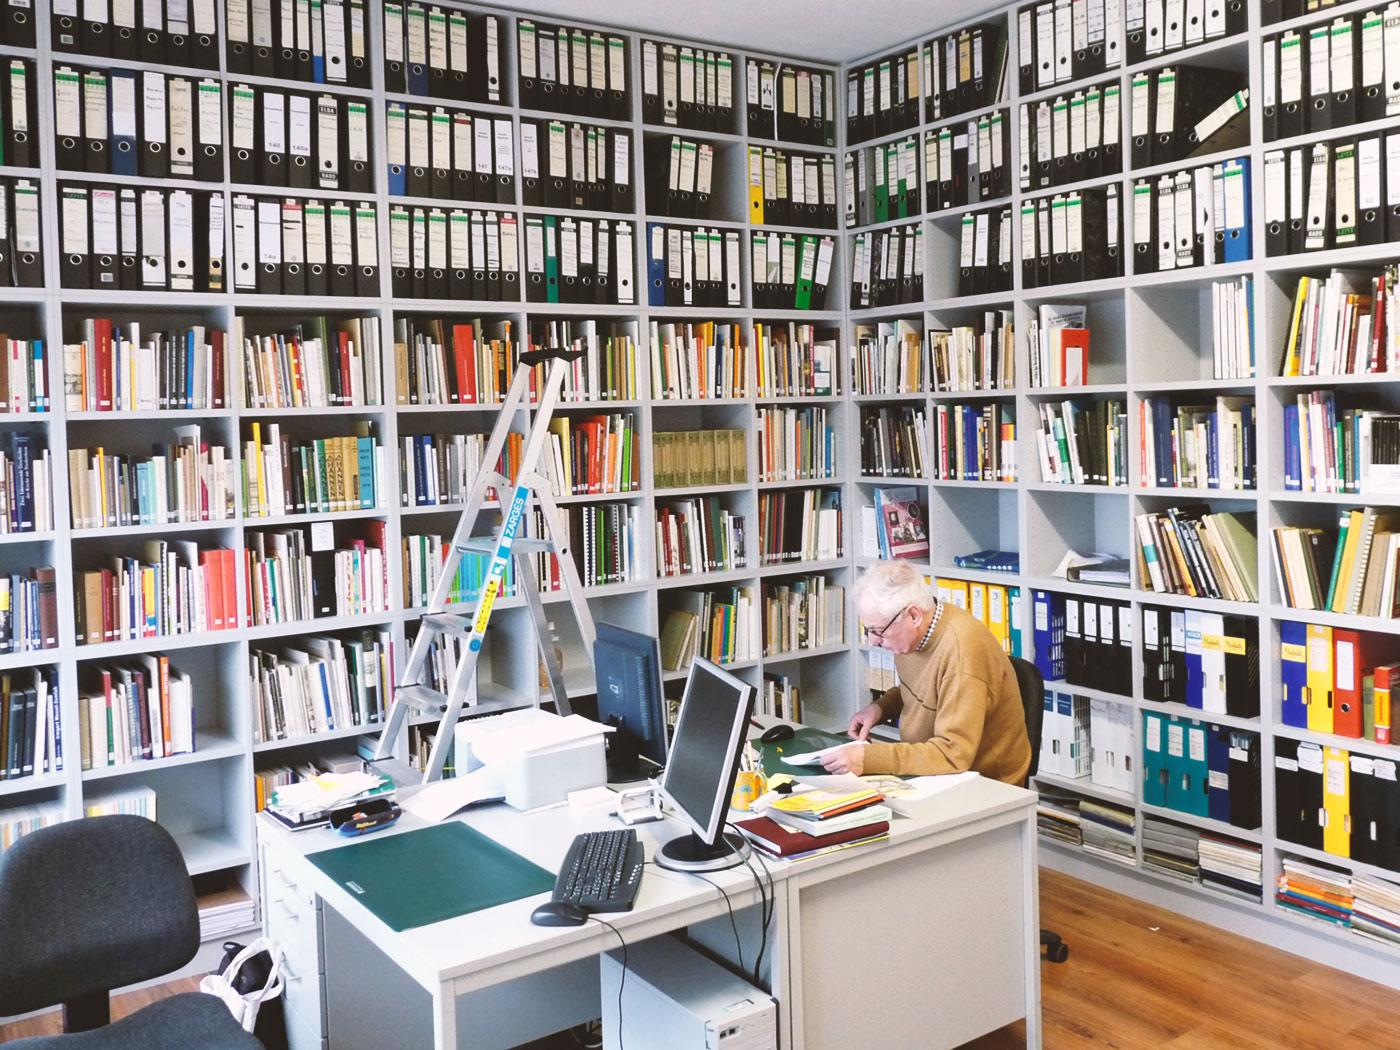 Das Franz-Matenaar-Archiv